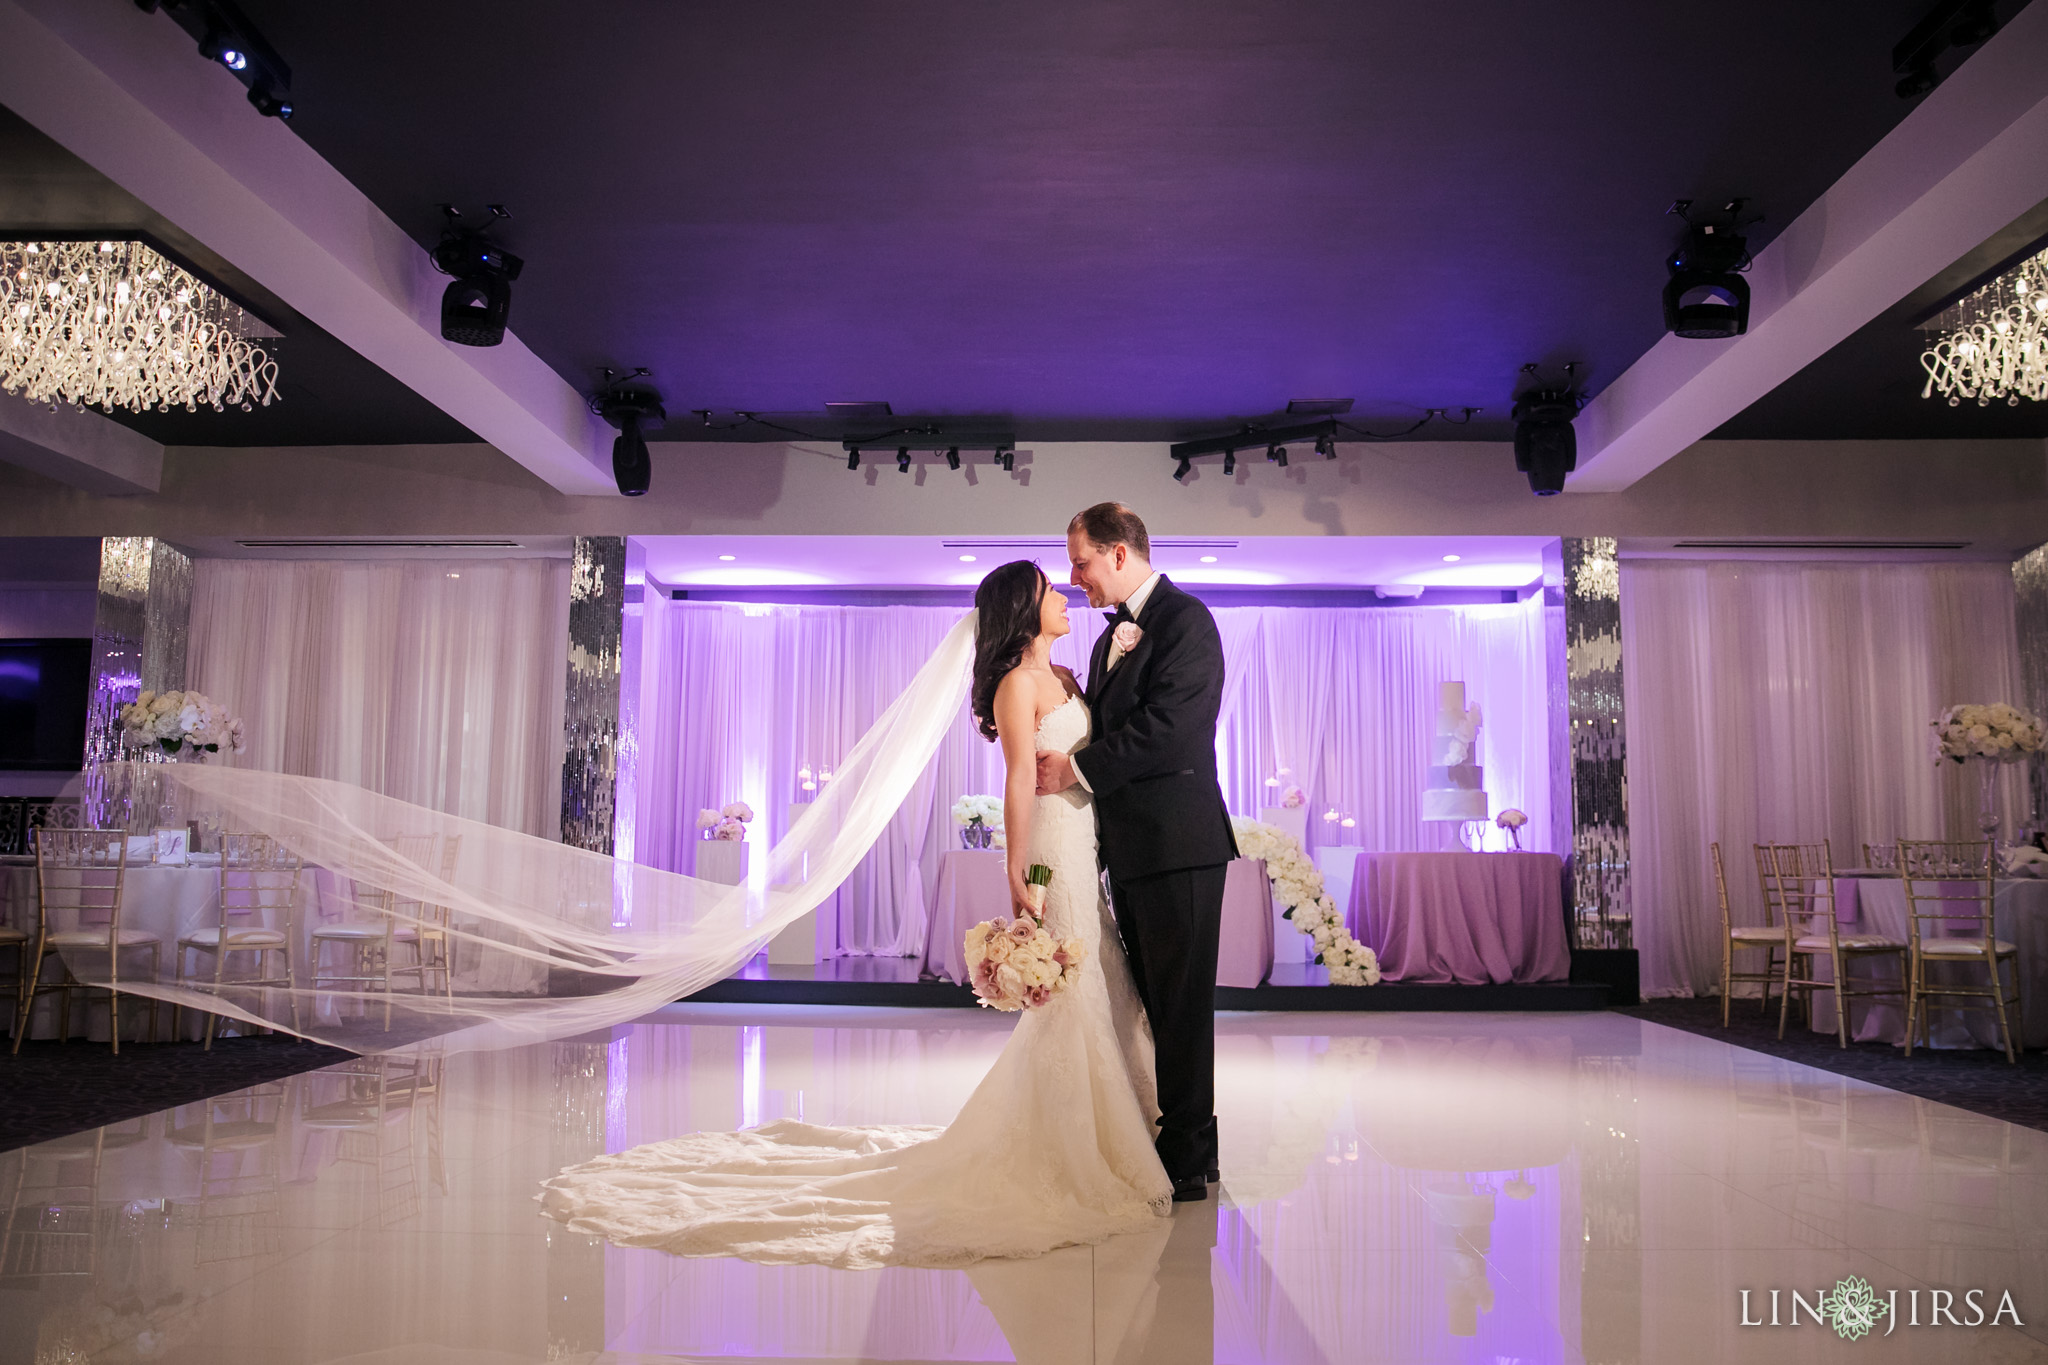 35 vertigo banquet hall glendale wedding photography